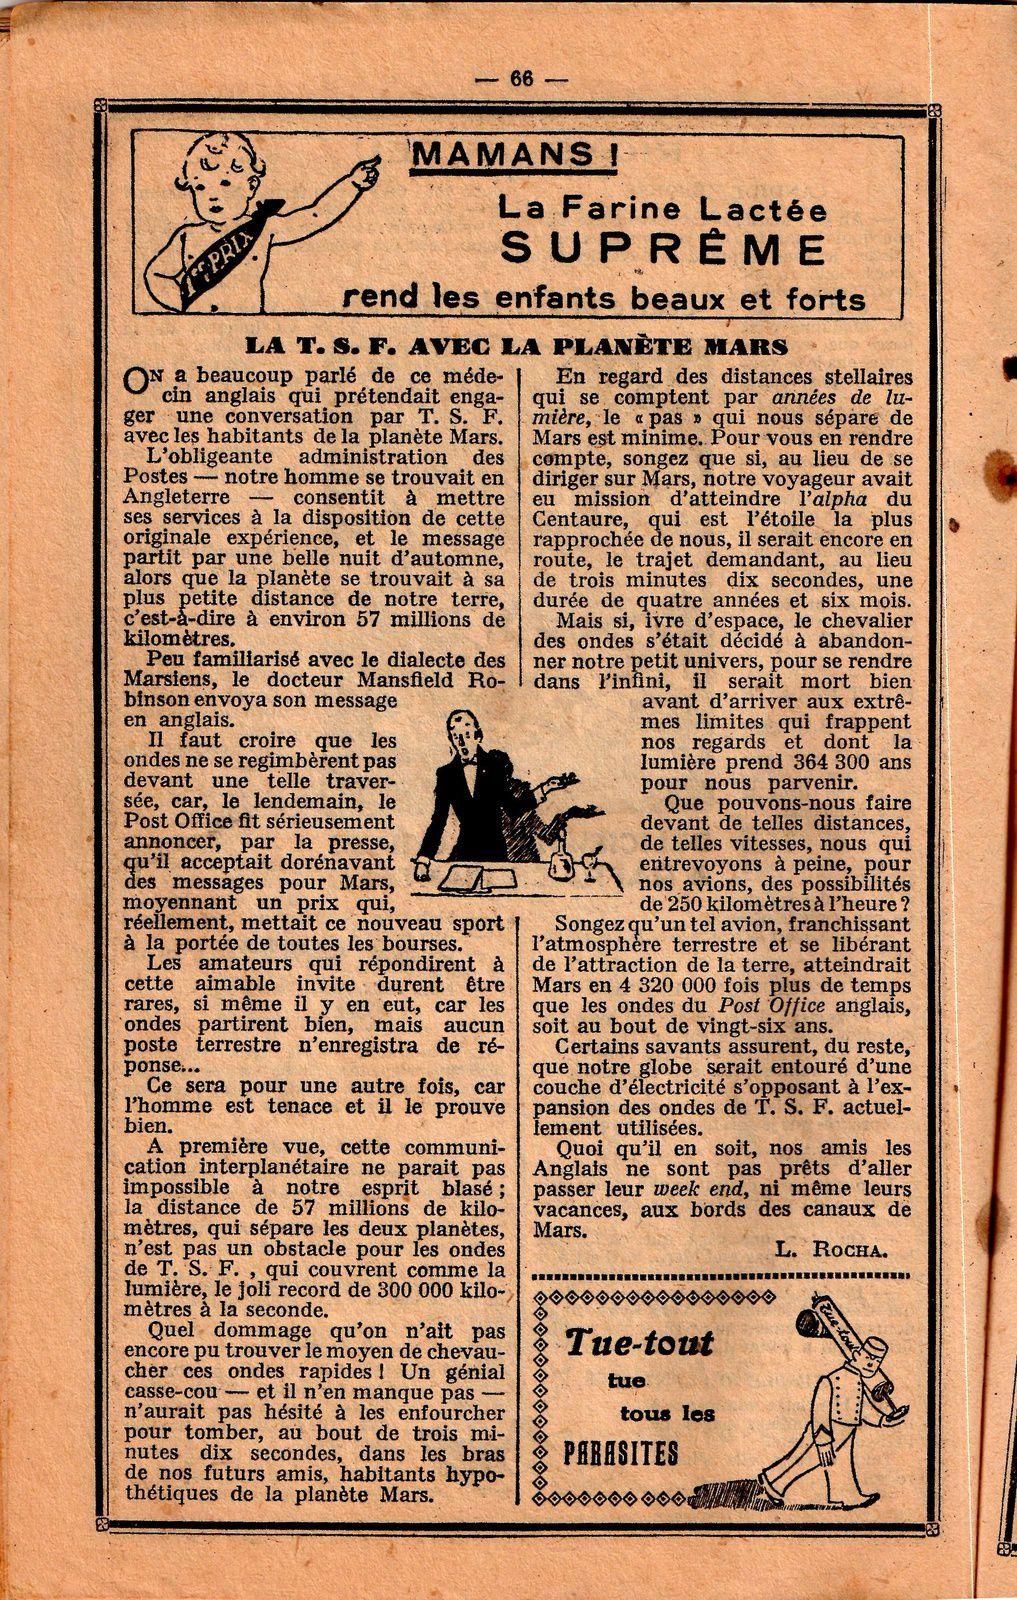 L. Rocha - La T.S.F. avec la Planète Mars (1933)